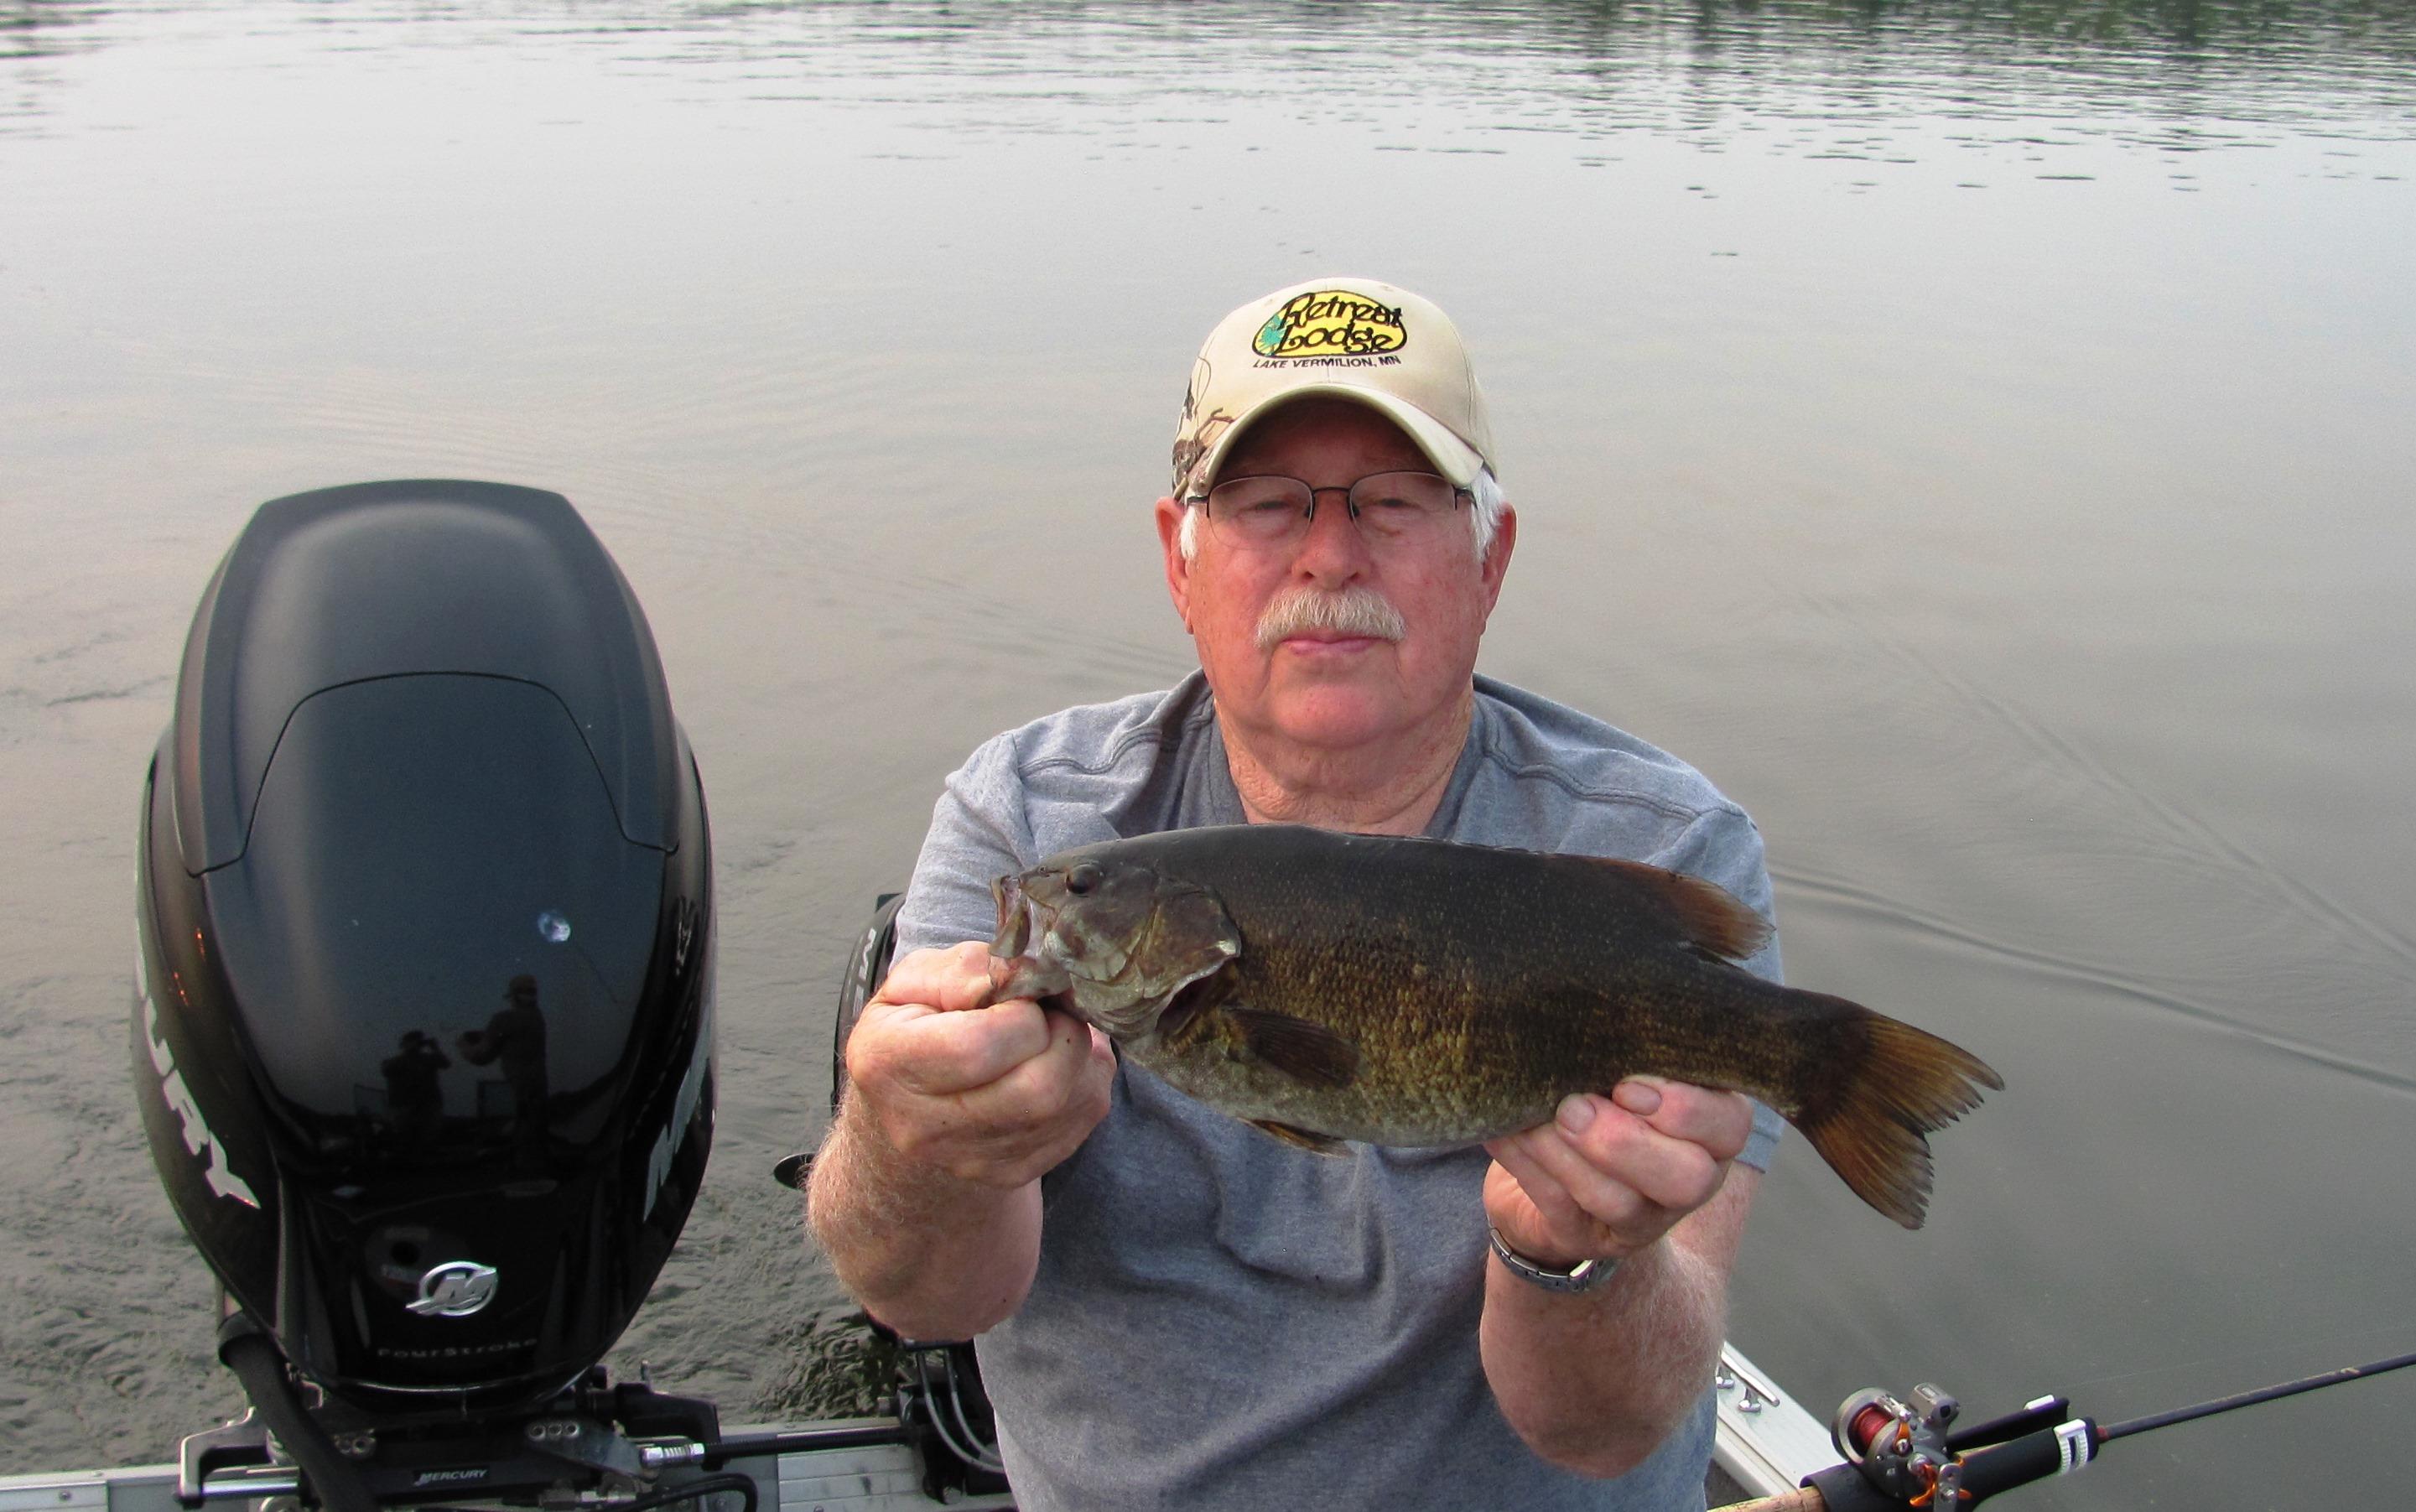 Joes big bass